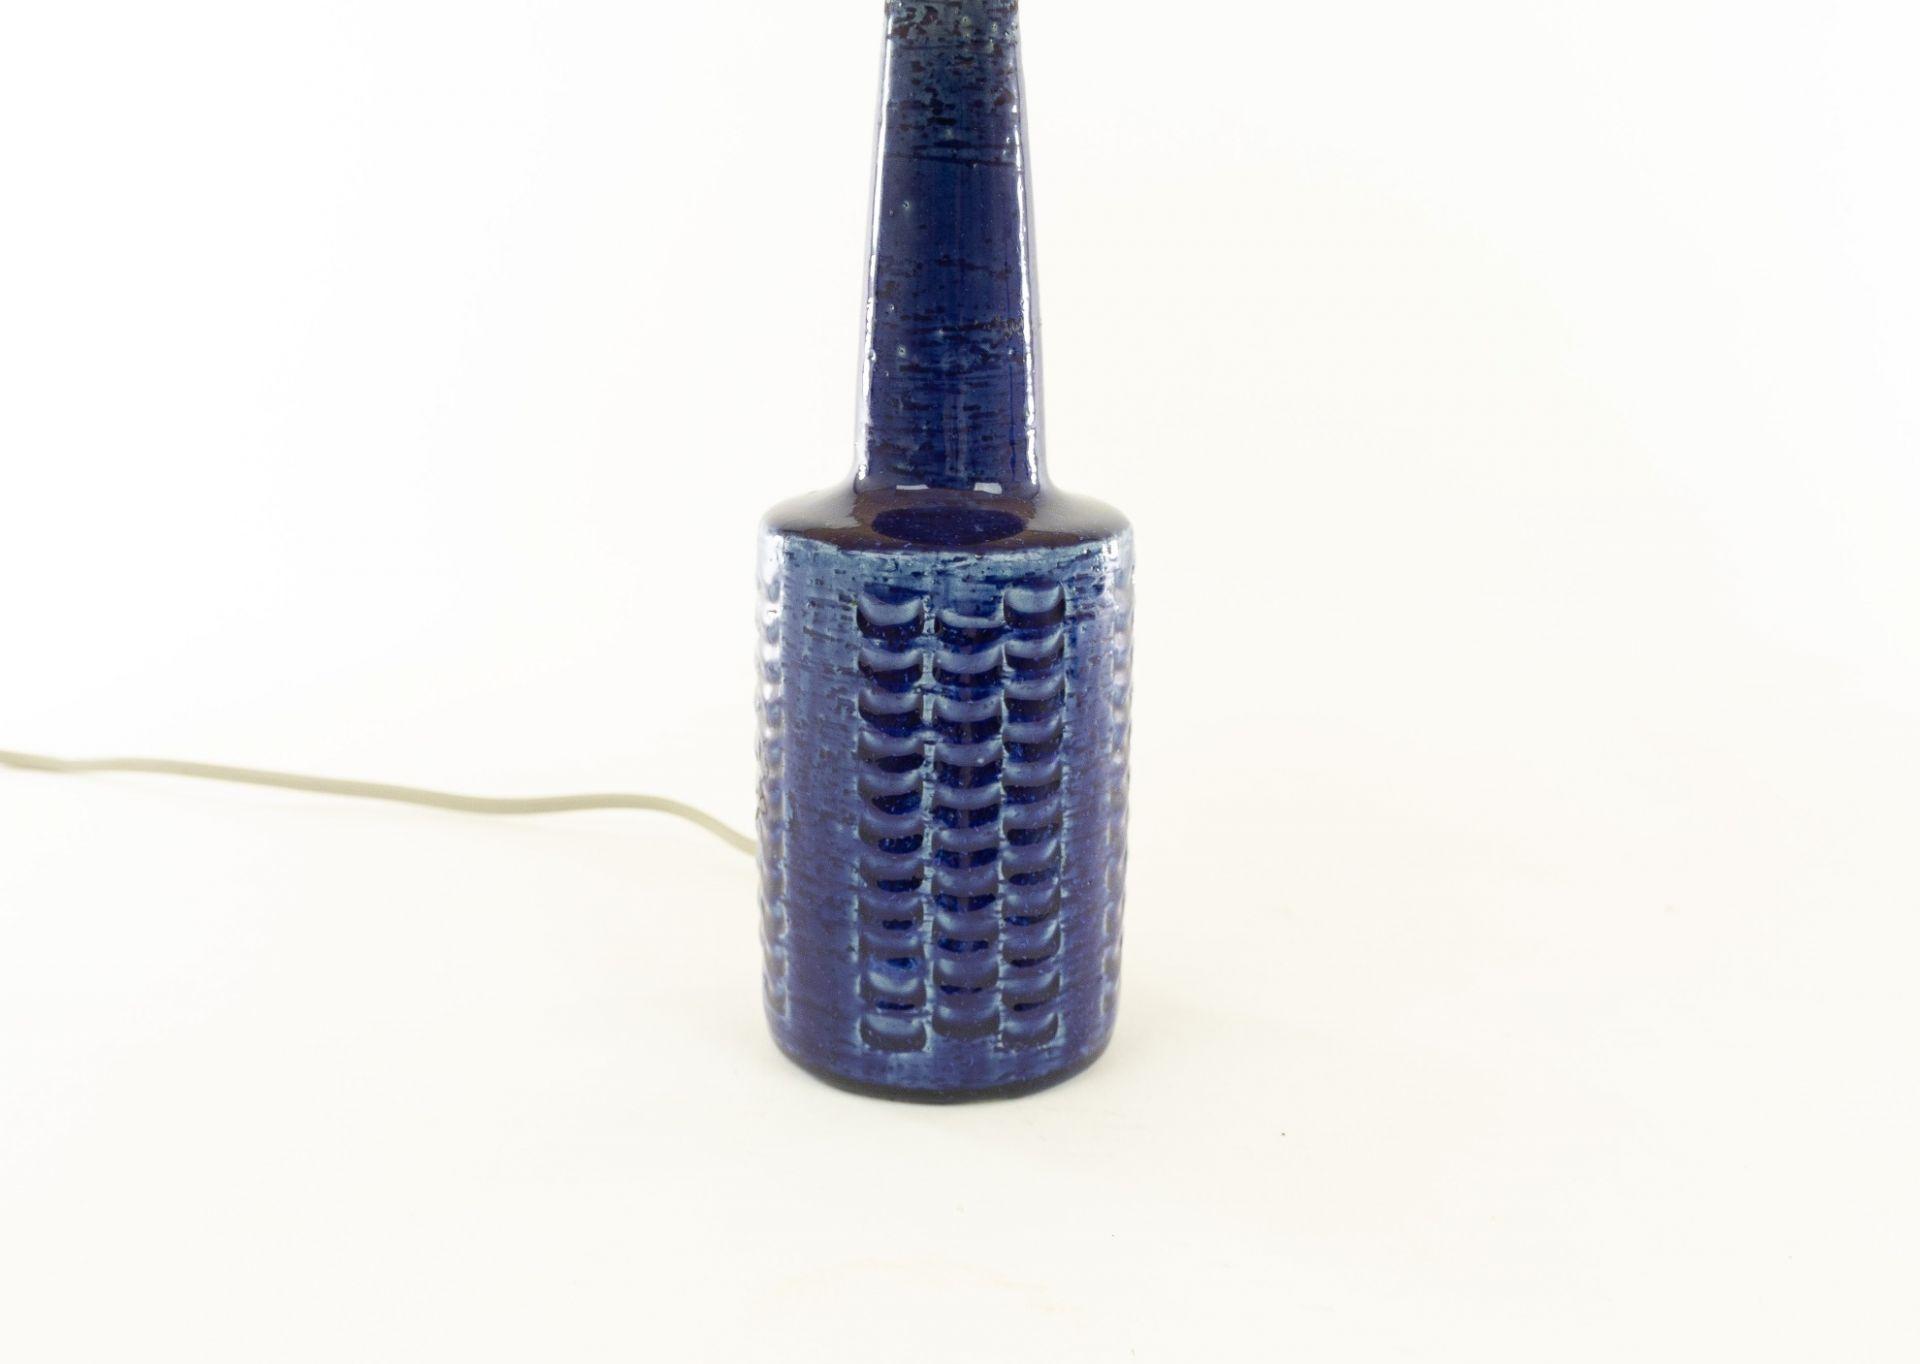 Pair of cobalt blue table lamps DL/21 by Per Linnemann-Schmidt for Palshus